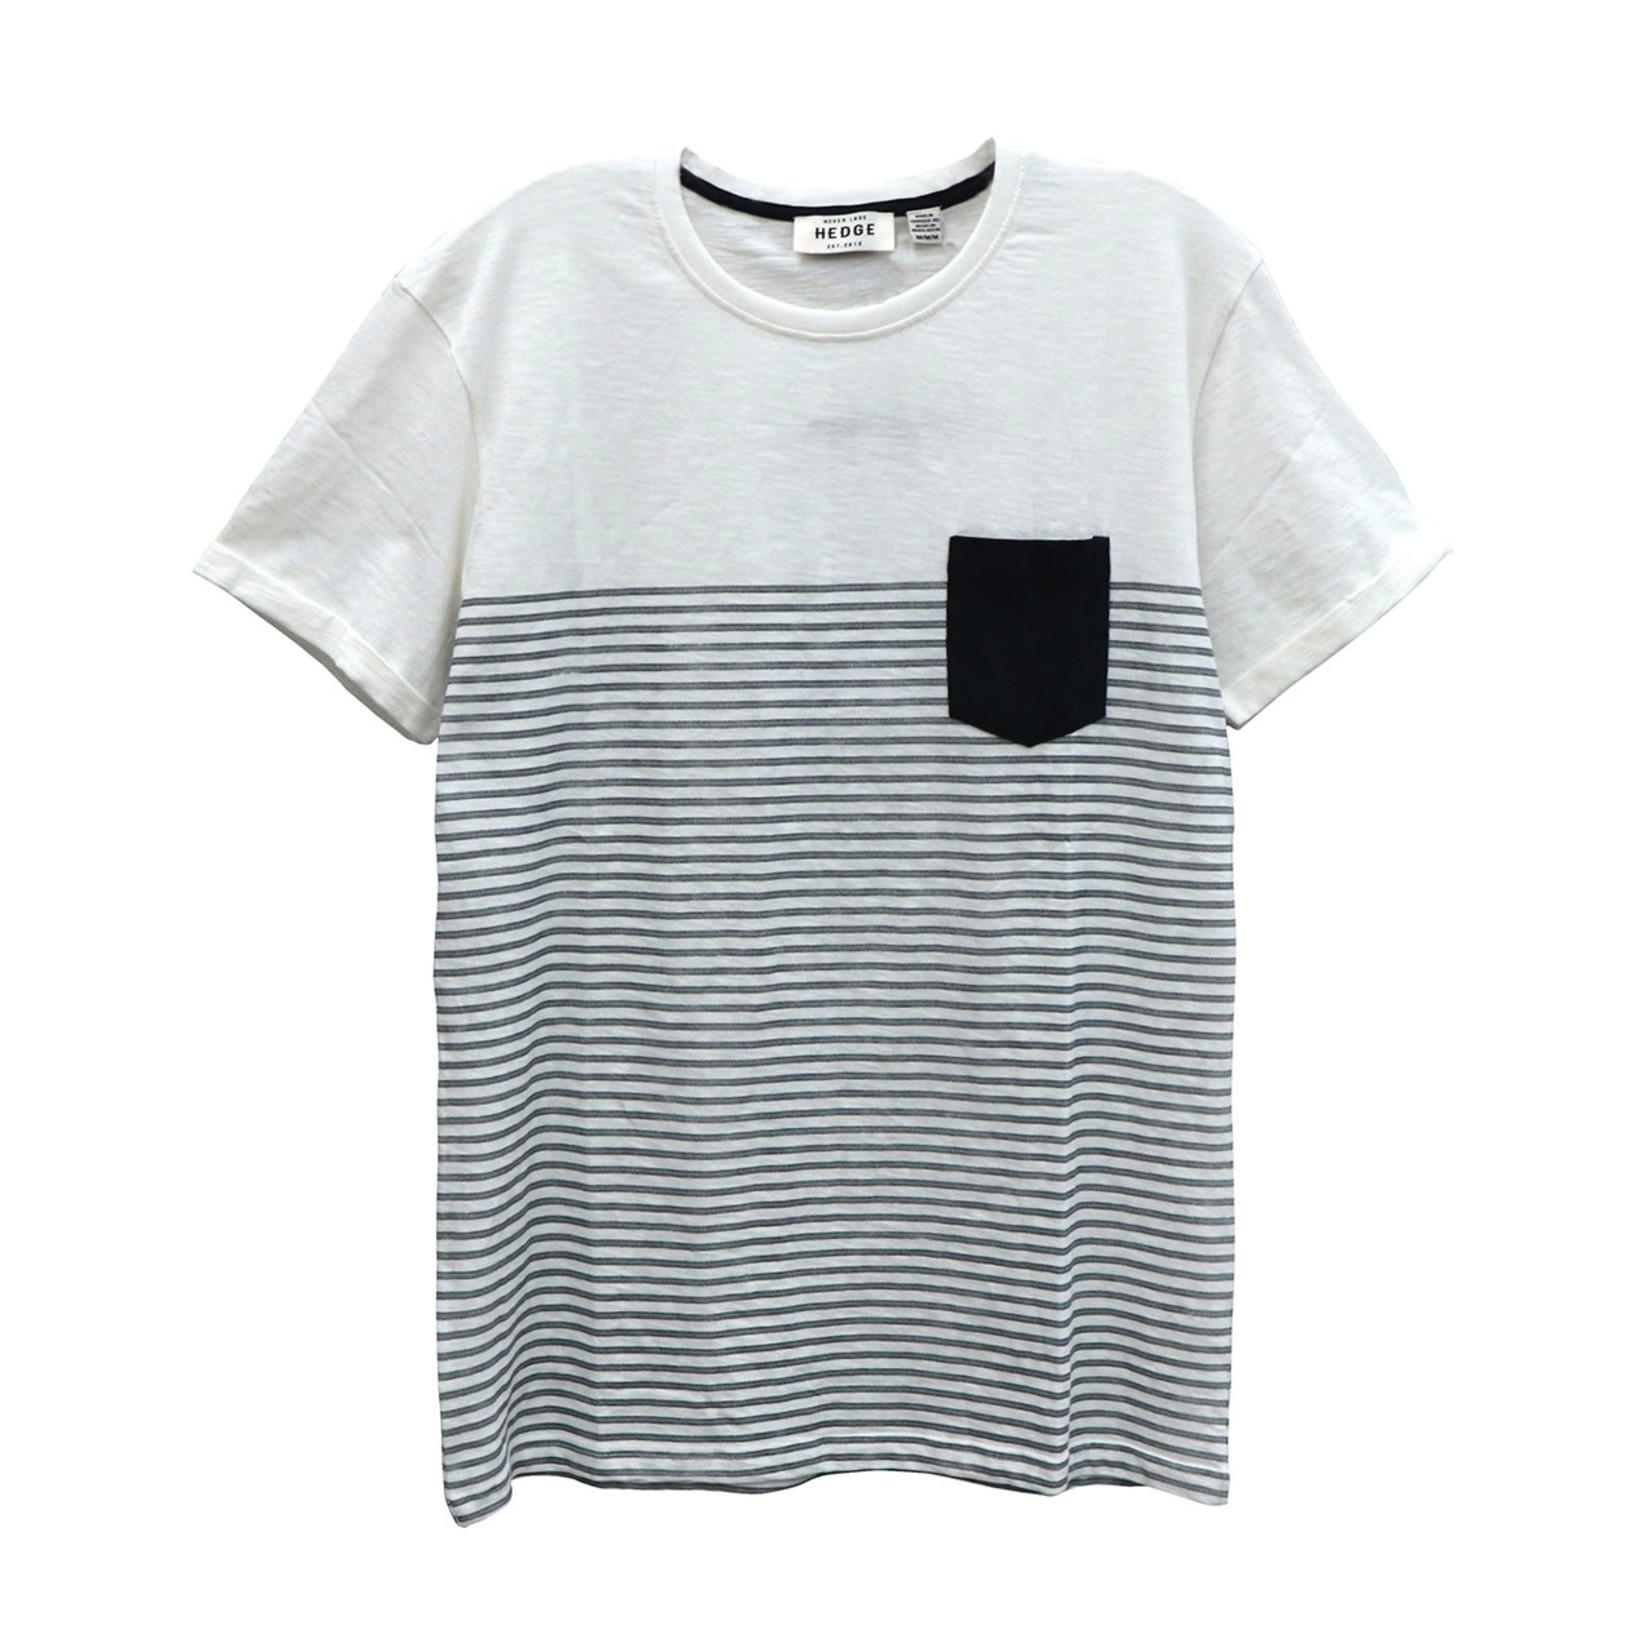 Hedge Men's knit tshirt off white